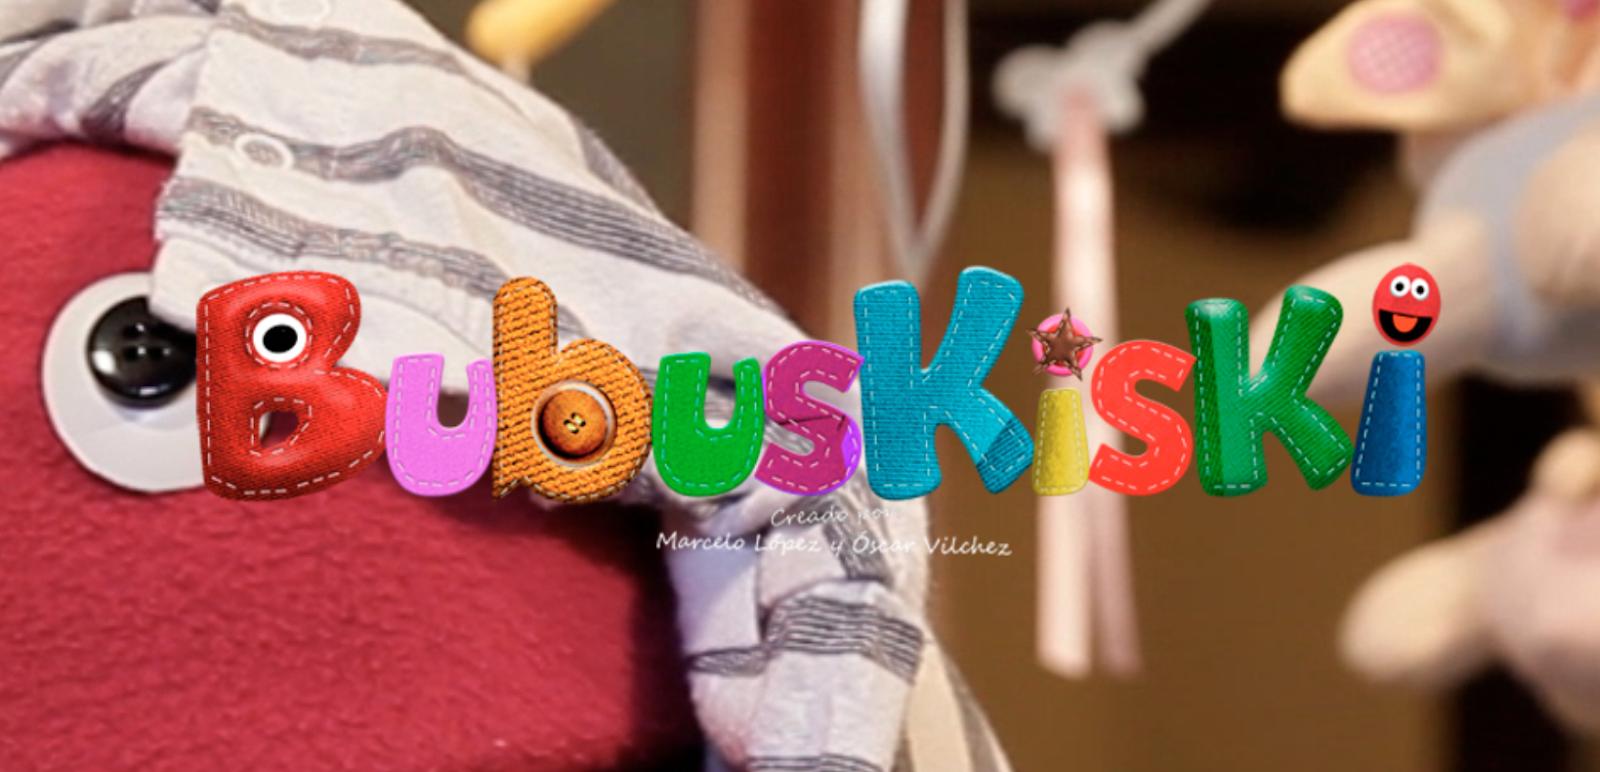 Bubuskiski